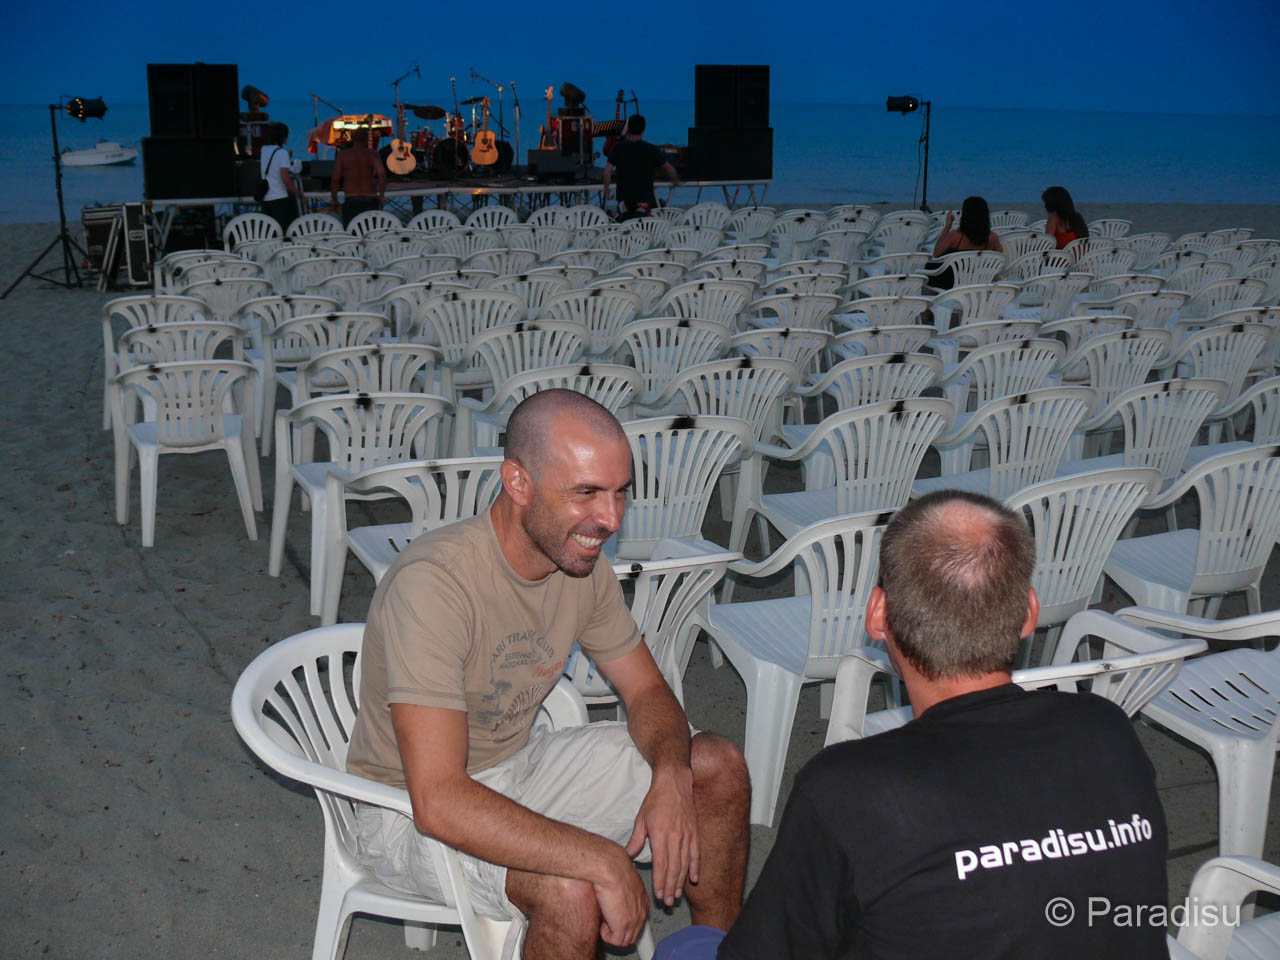 Jean-Charles Papi Interview Paradisu